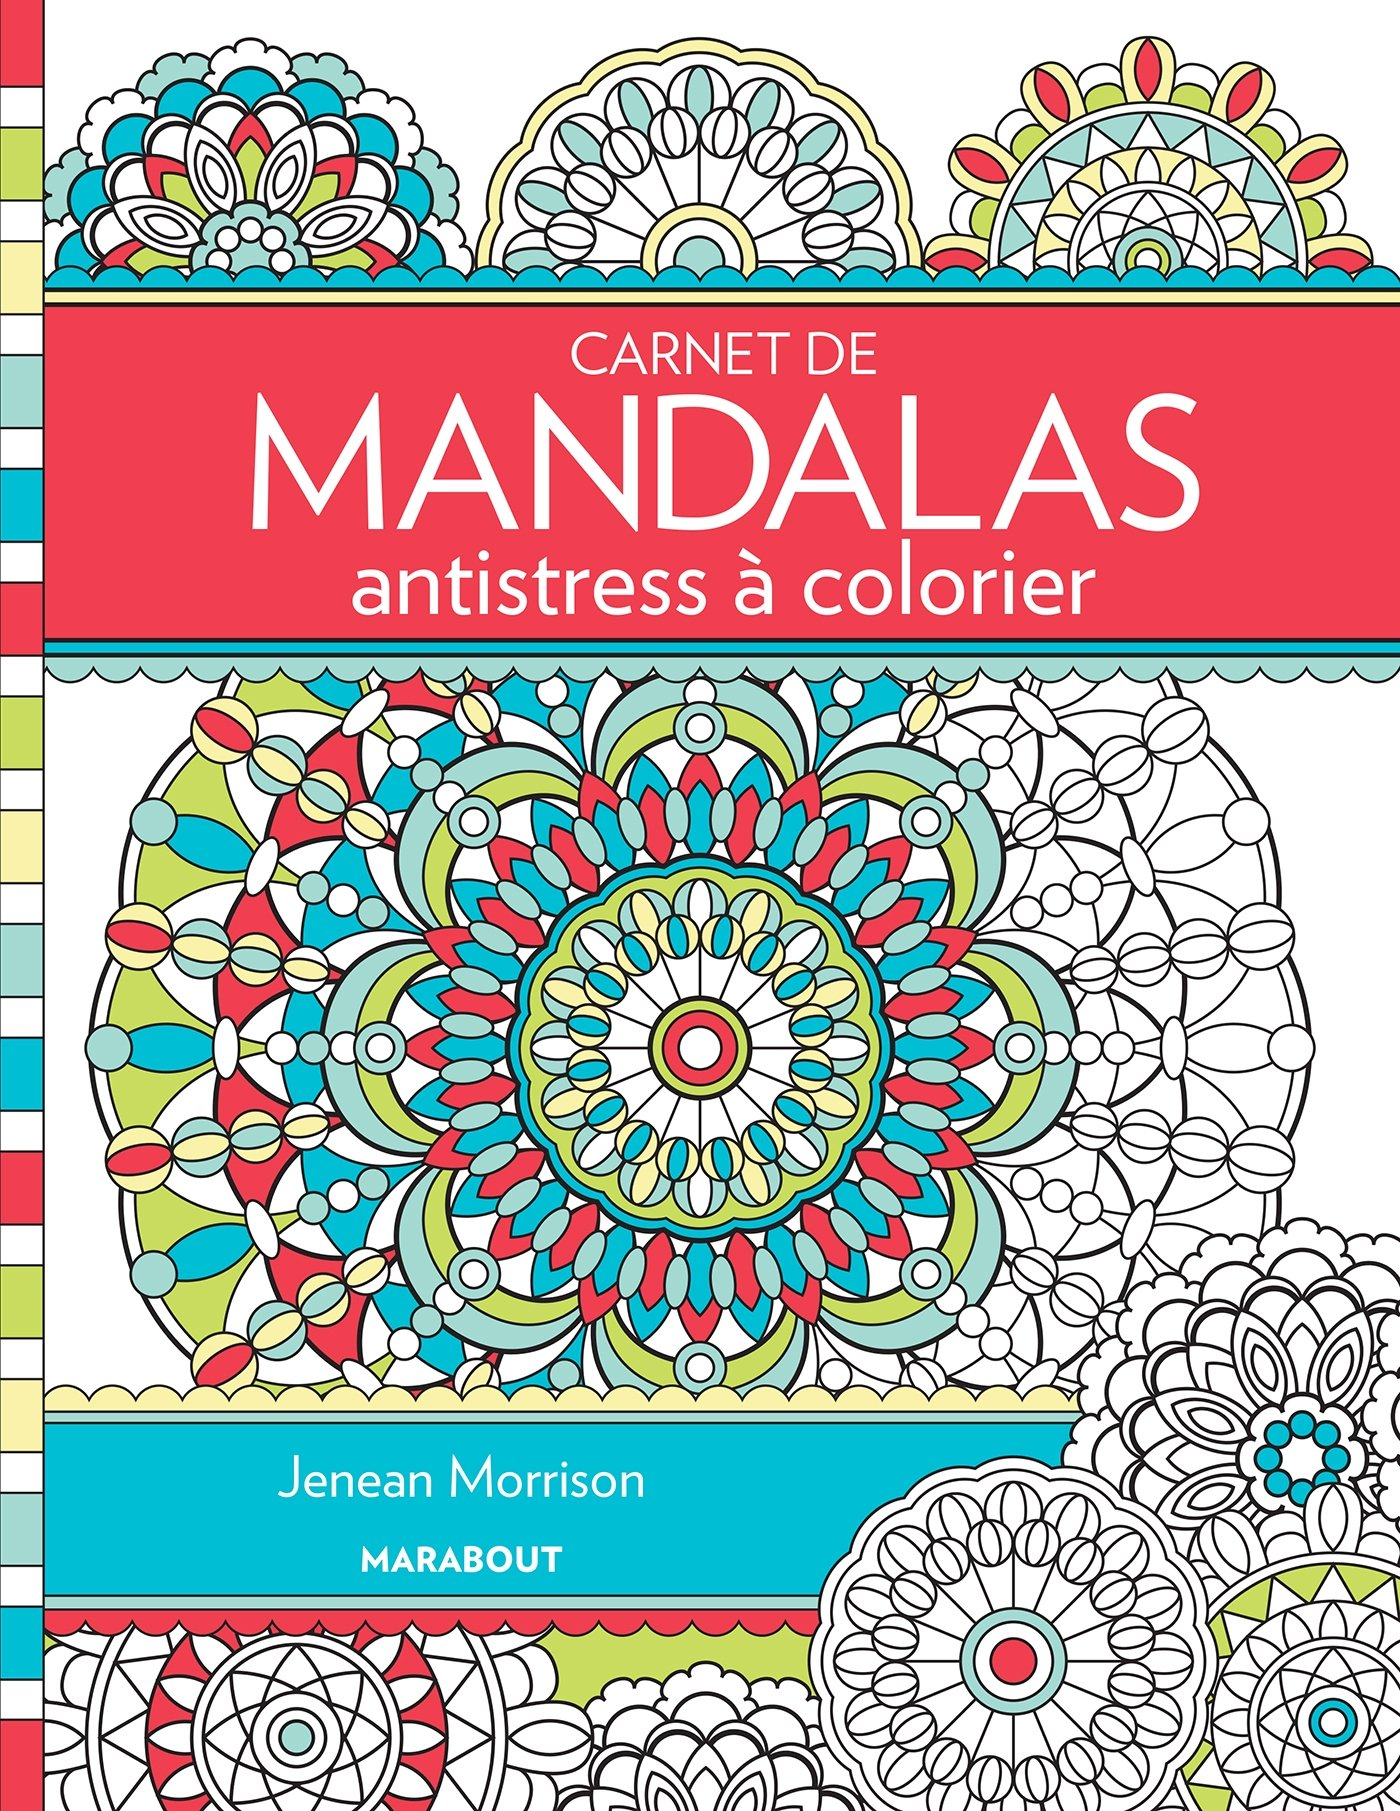 Carnet De Mandalas Antistress A Colorier Amazon Fr Jenean Morrison